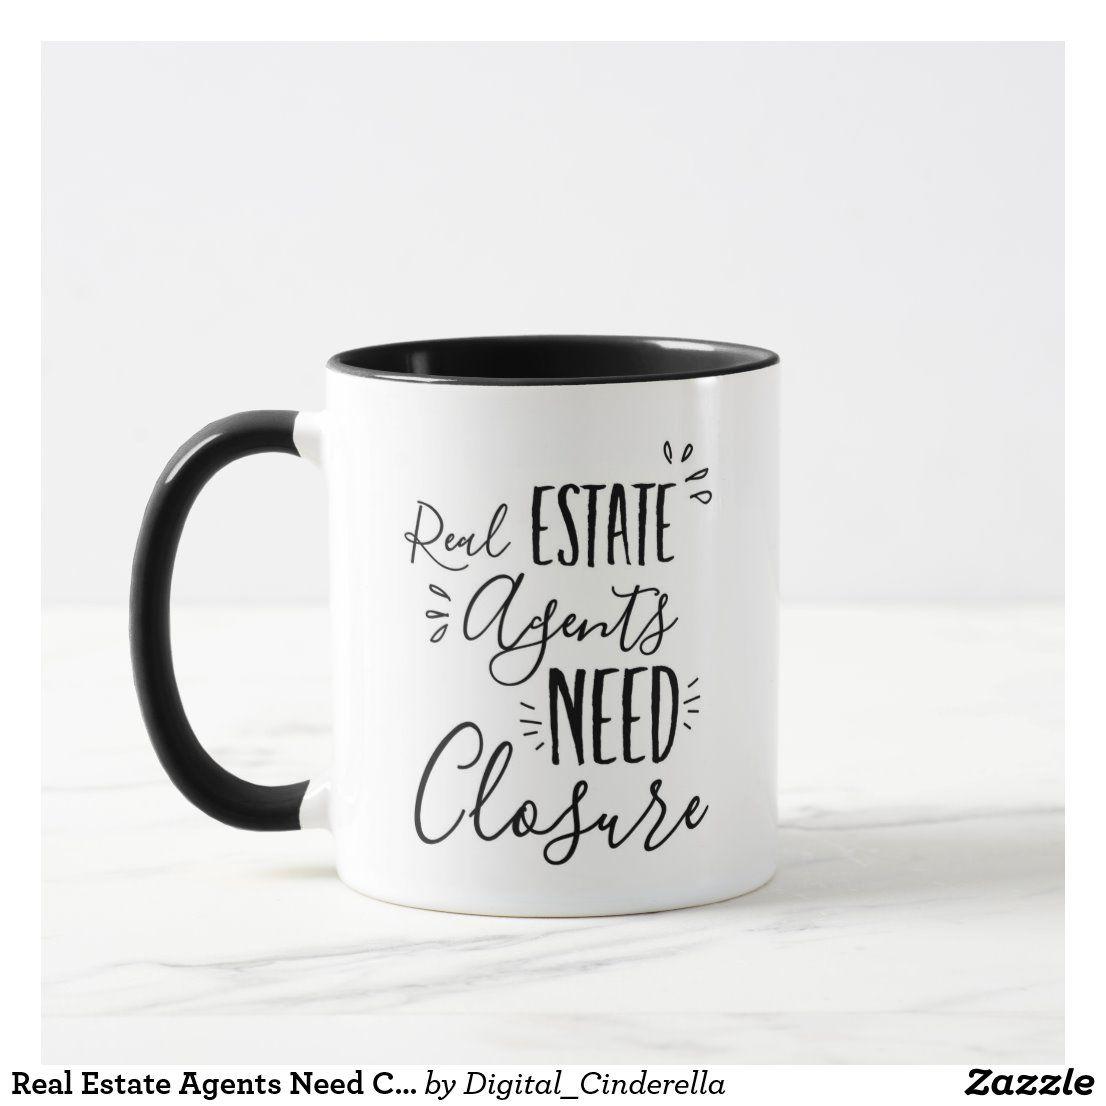 Real Estate Agents Need Closure Coffee Mug in